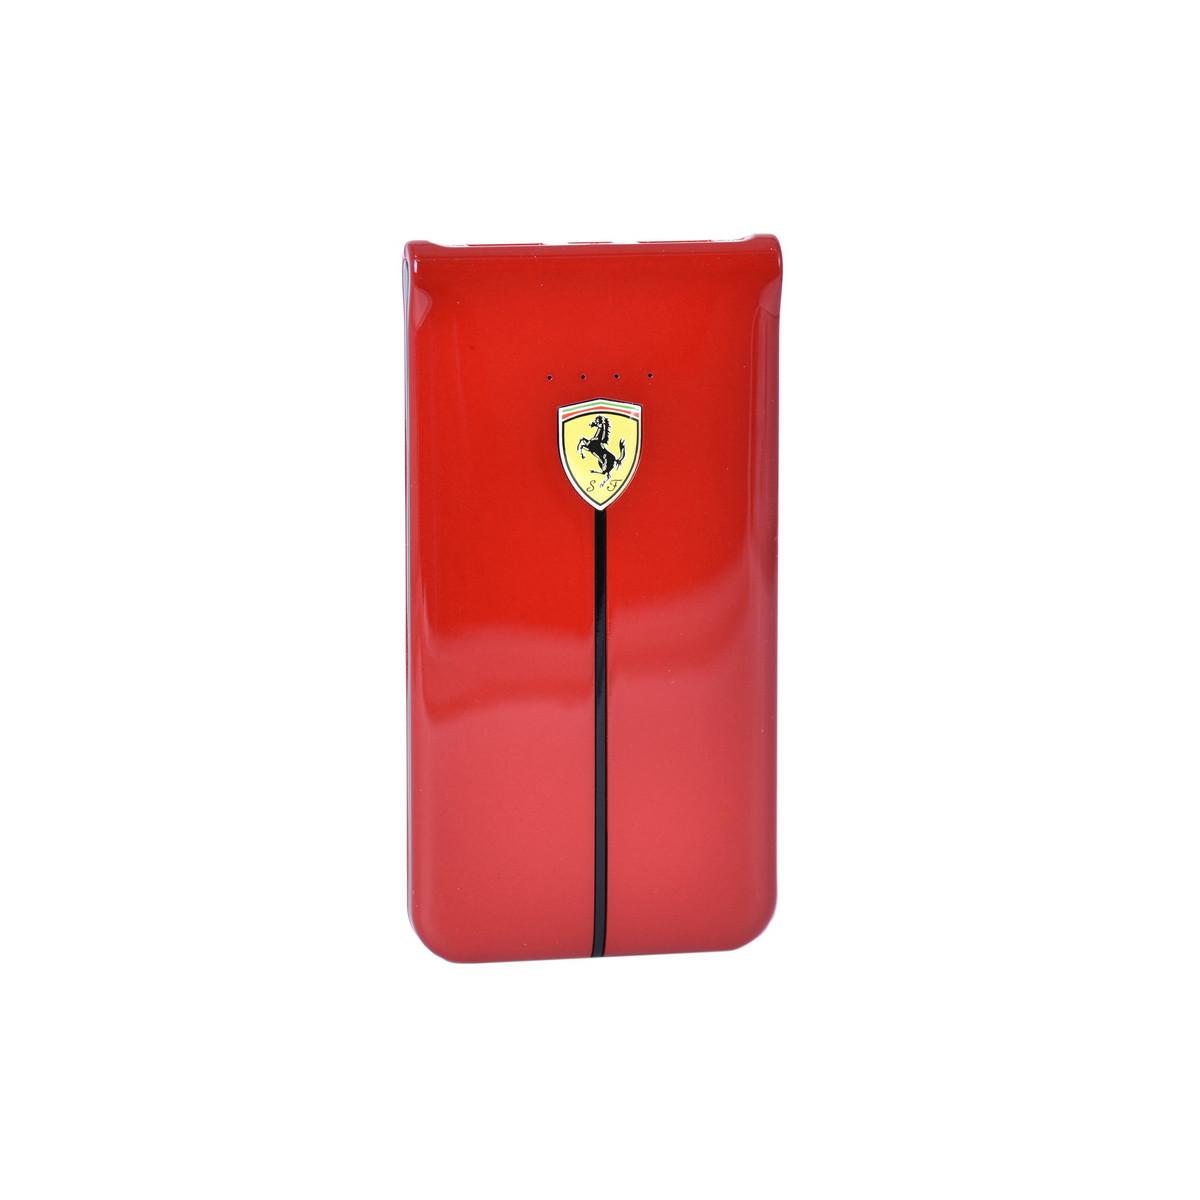 Power bank V74 Ferrari 6000mAh 1XUSB Red/Black